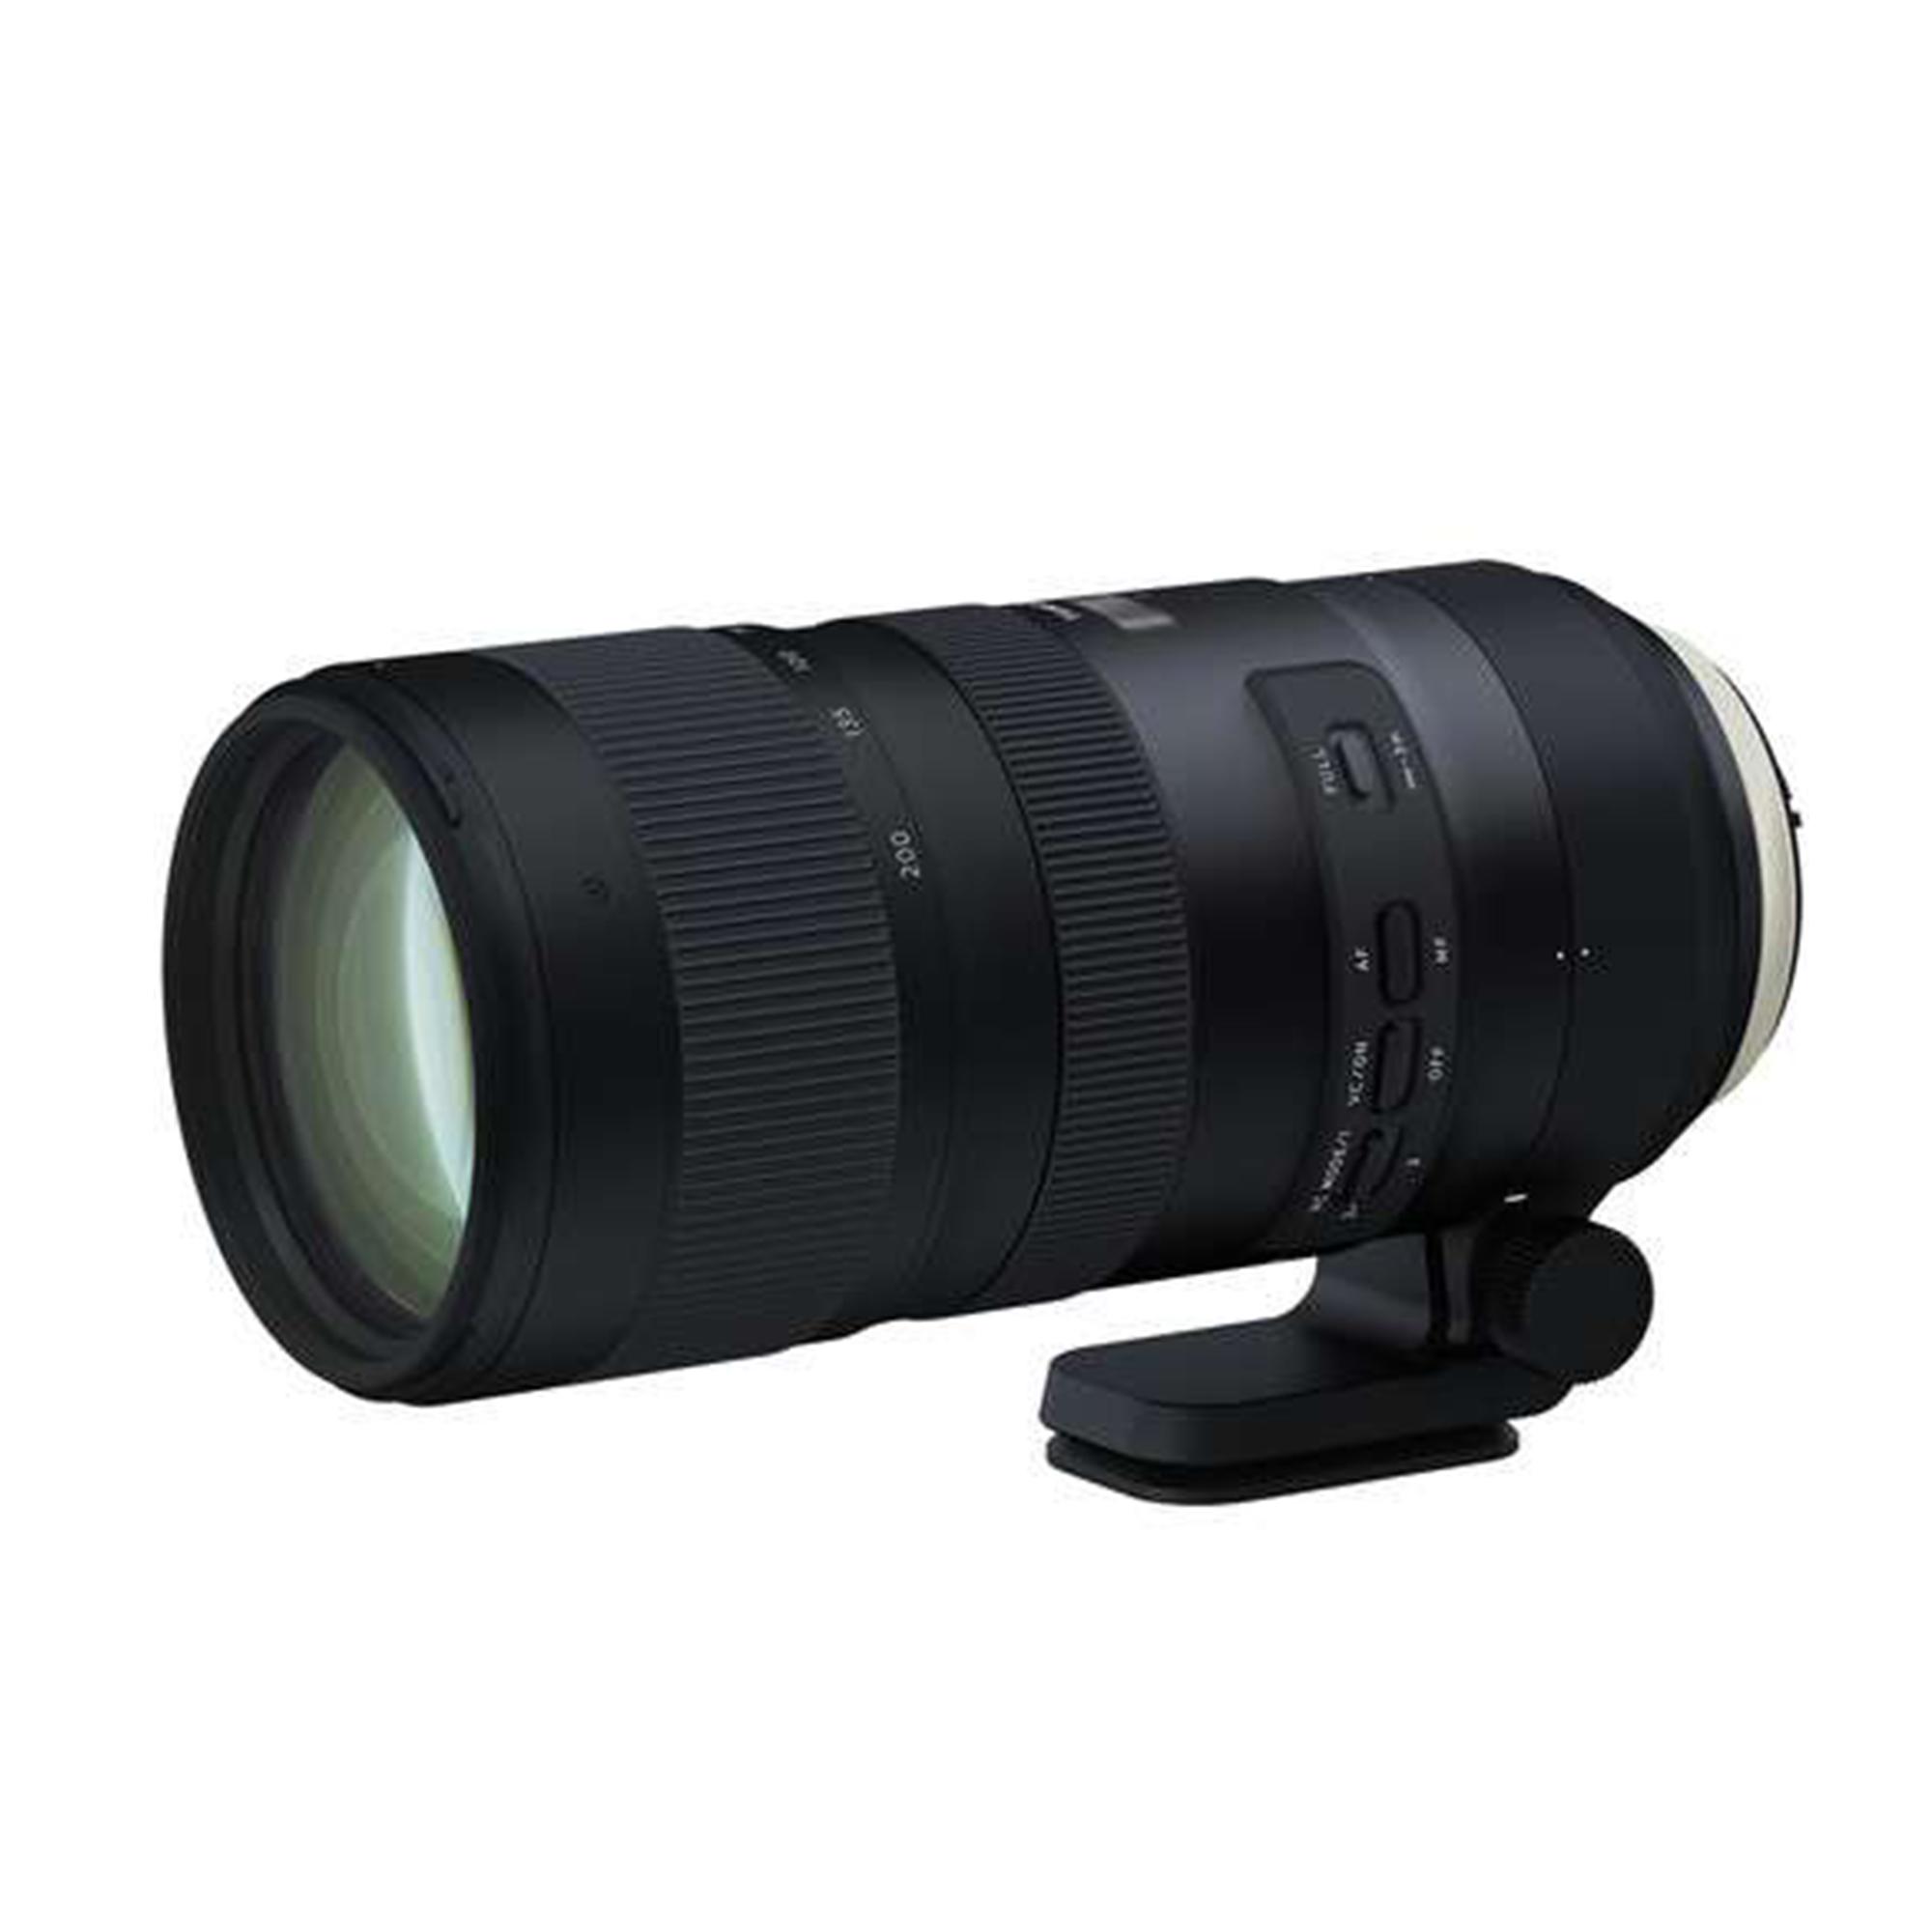 Tamron SP 70-200mm f/2.8 Di VC USD G2 Lens for Nikon F